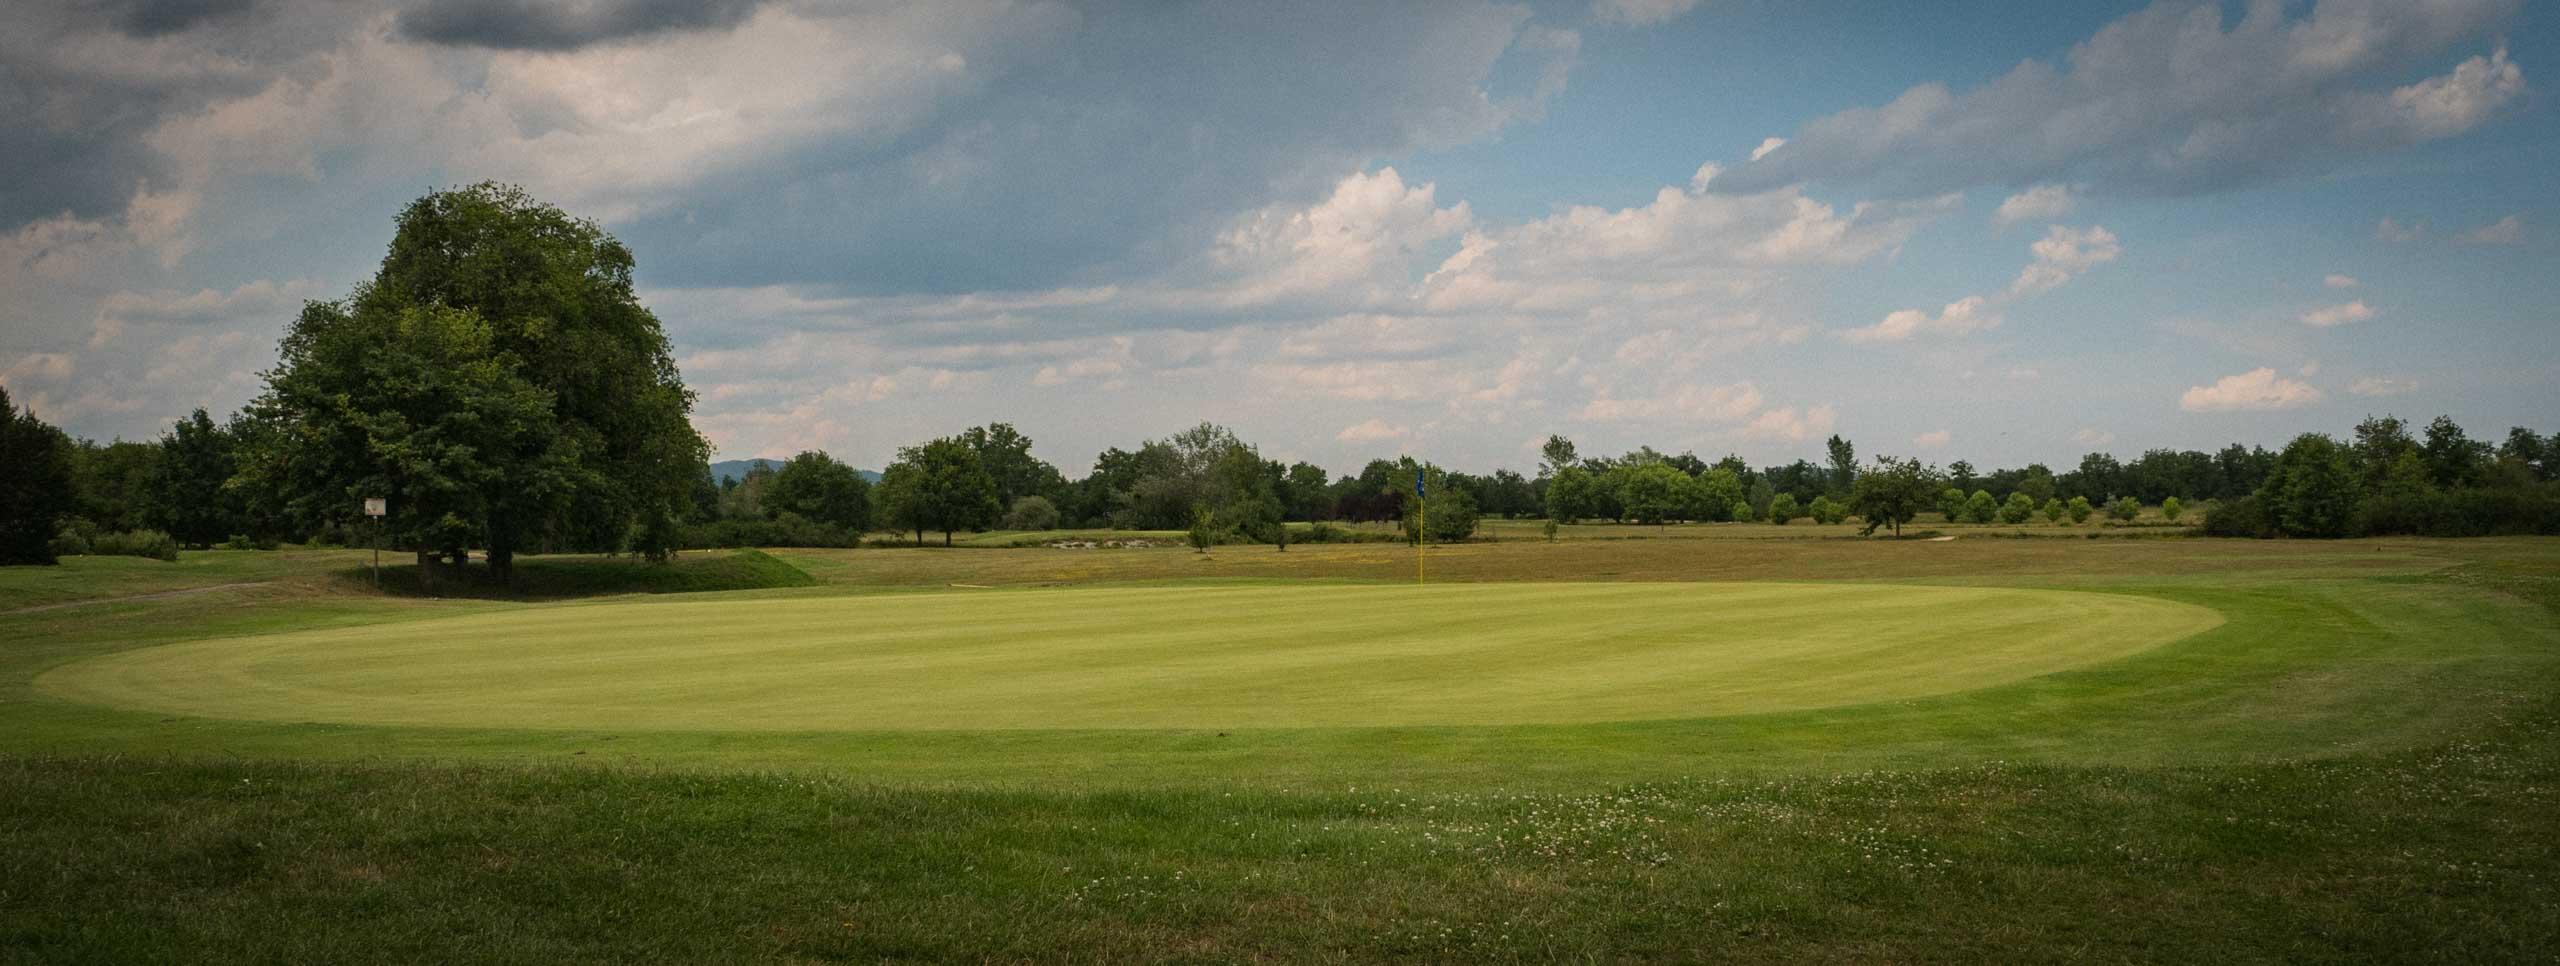 Born For Golf Tour Etangs 2019 23